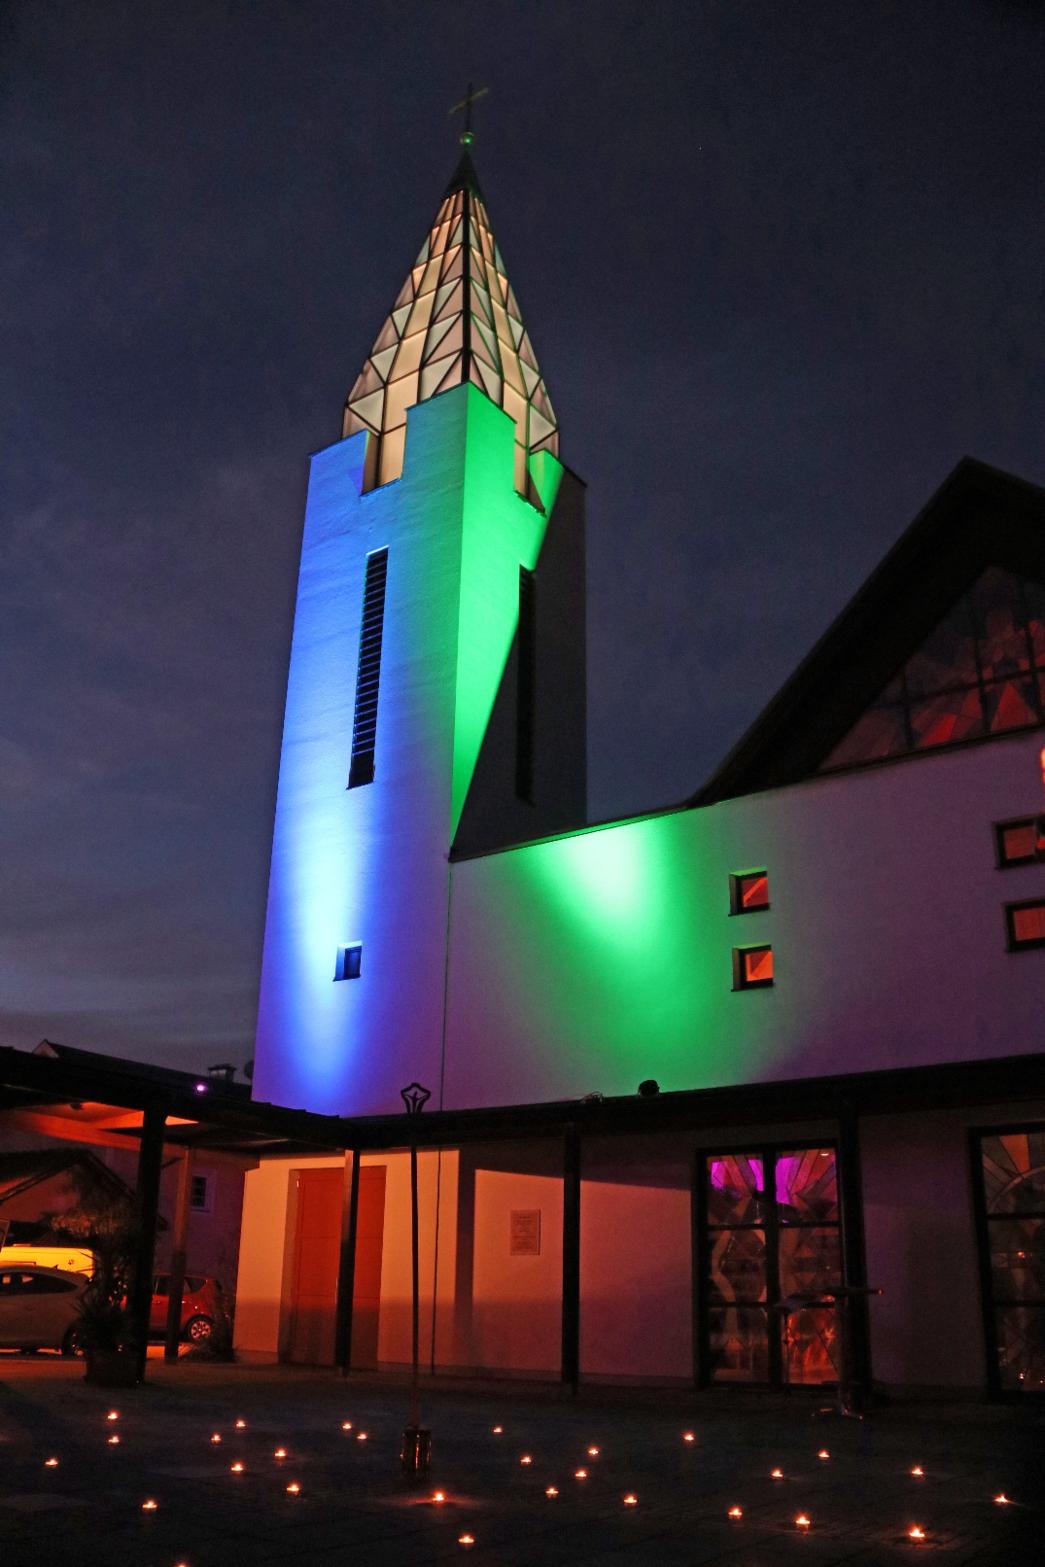 Beleuchteter Kirchturm und Pfarrhof mit Kerzen.